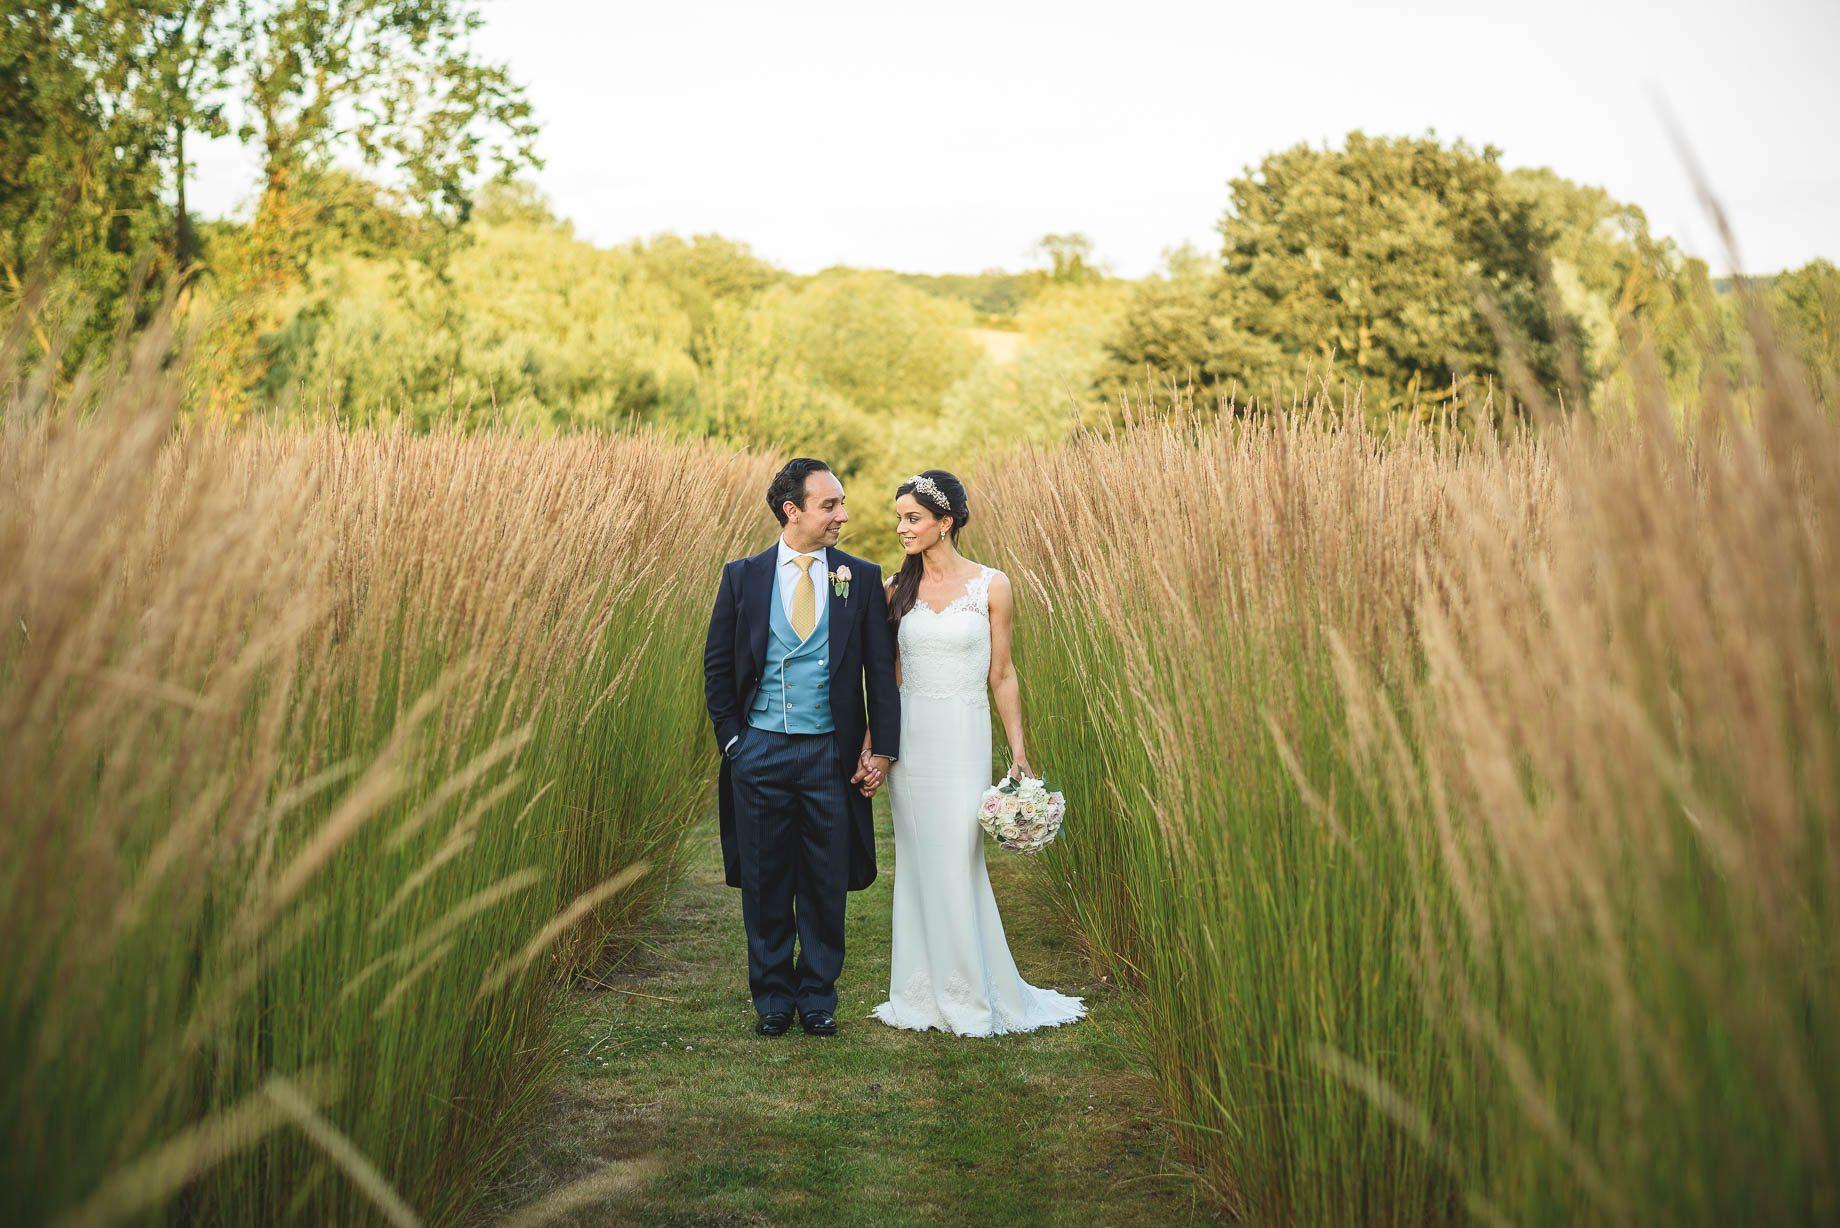 Bury Court Barn Wedding Photography - Caroline and Rob (183 of 219)